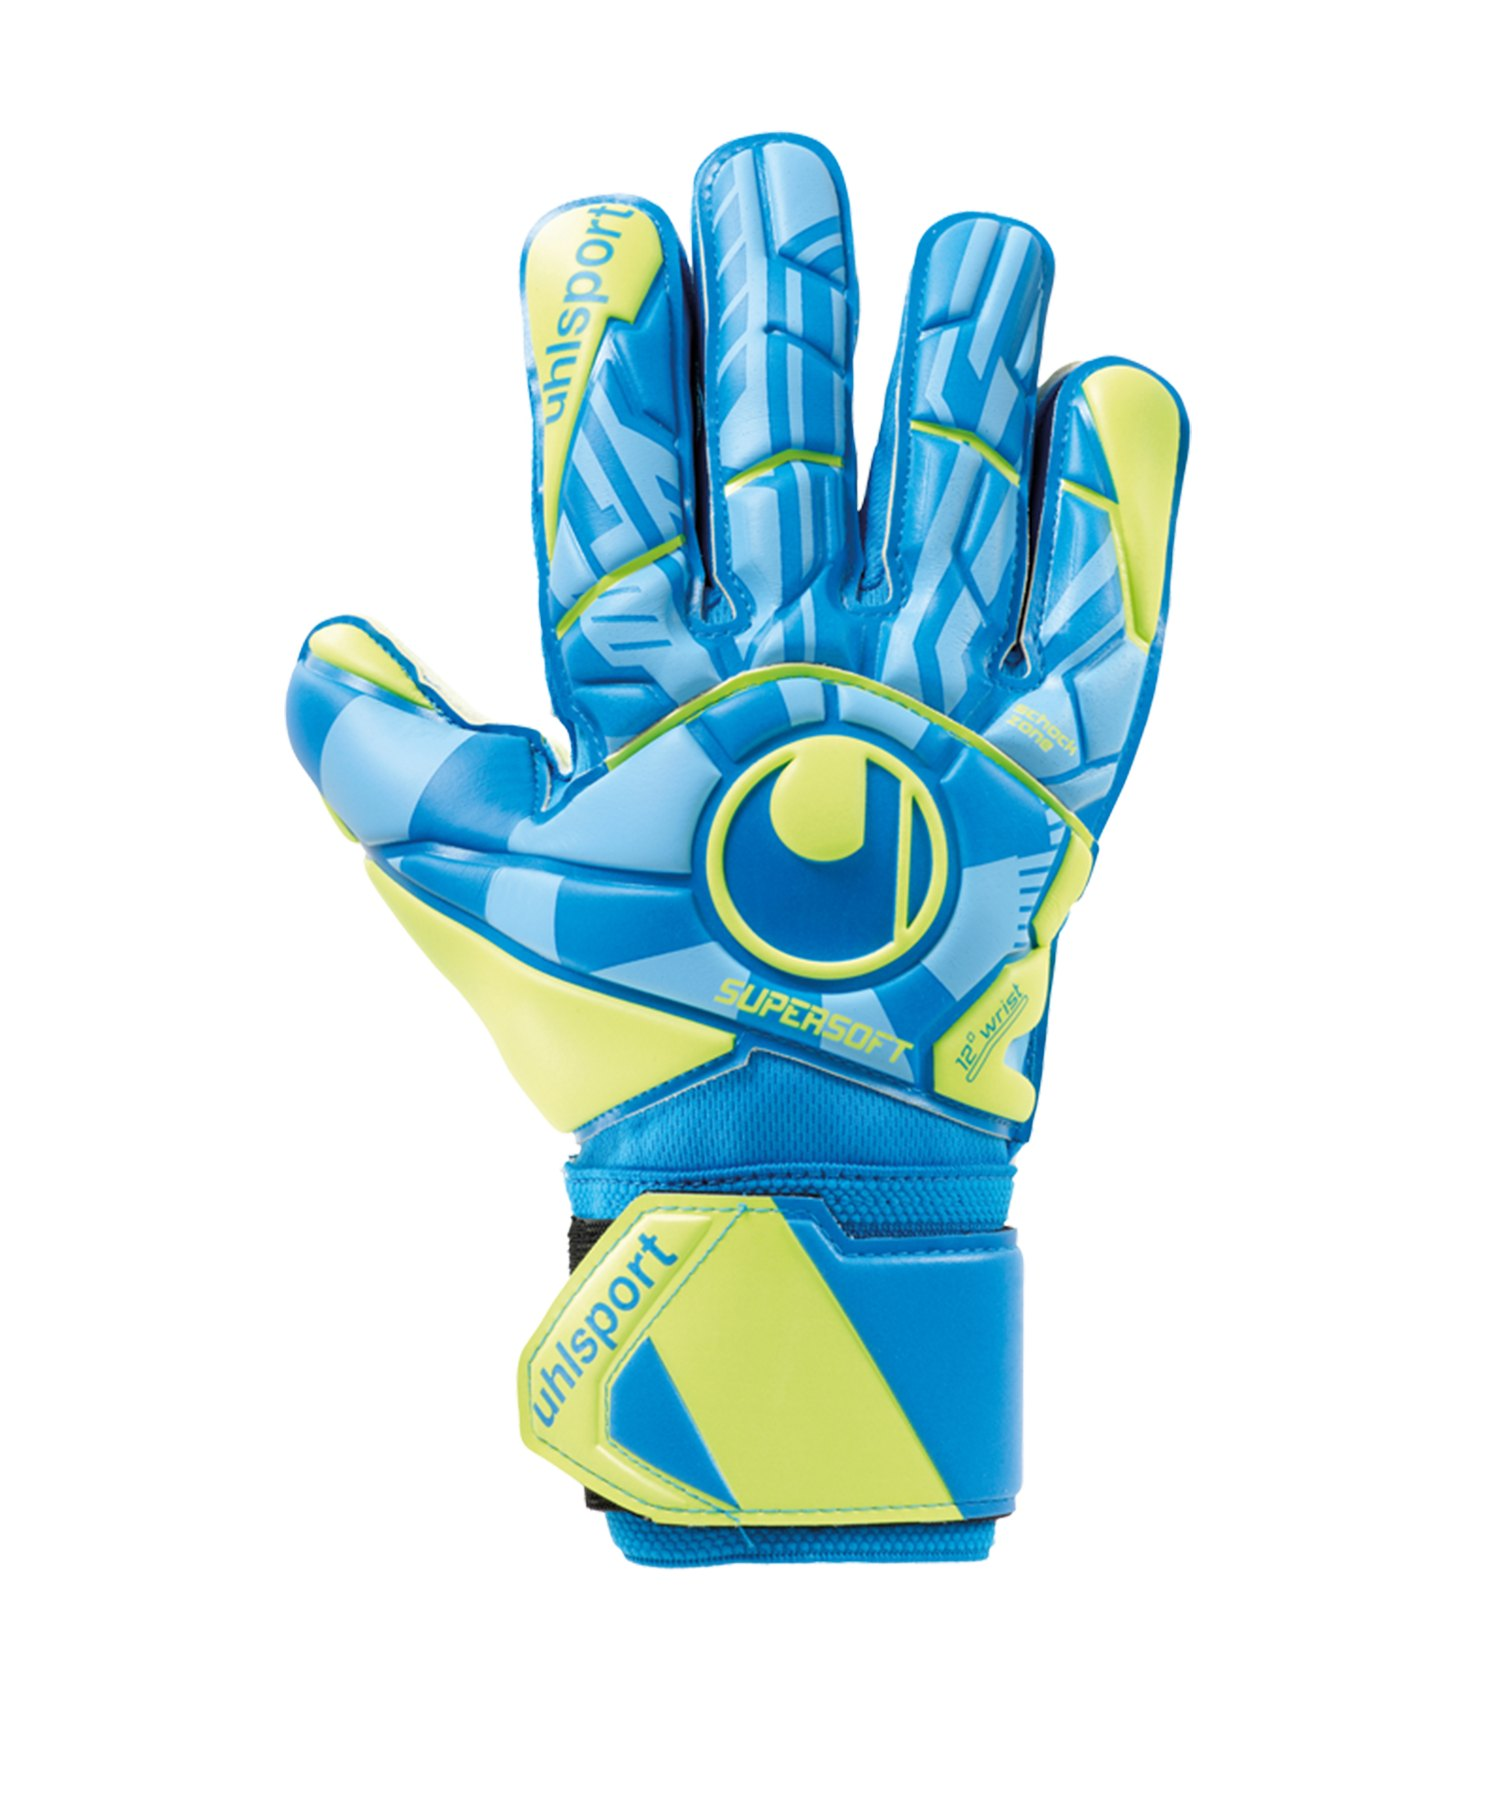 Uhlsport Radar Control Supersoft Handschuh F01 - Blau